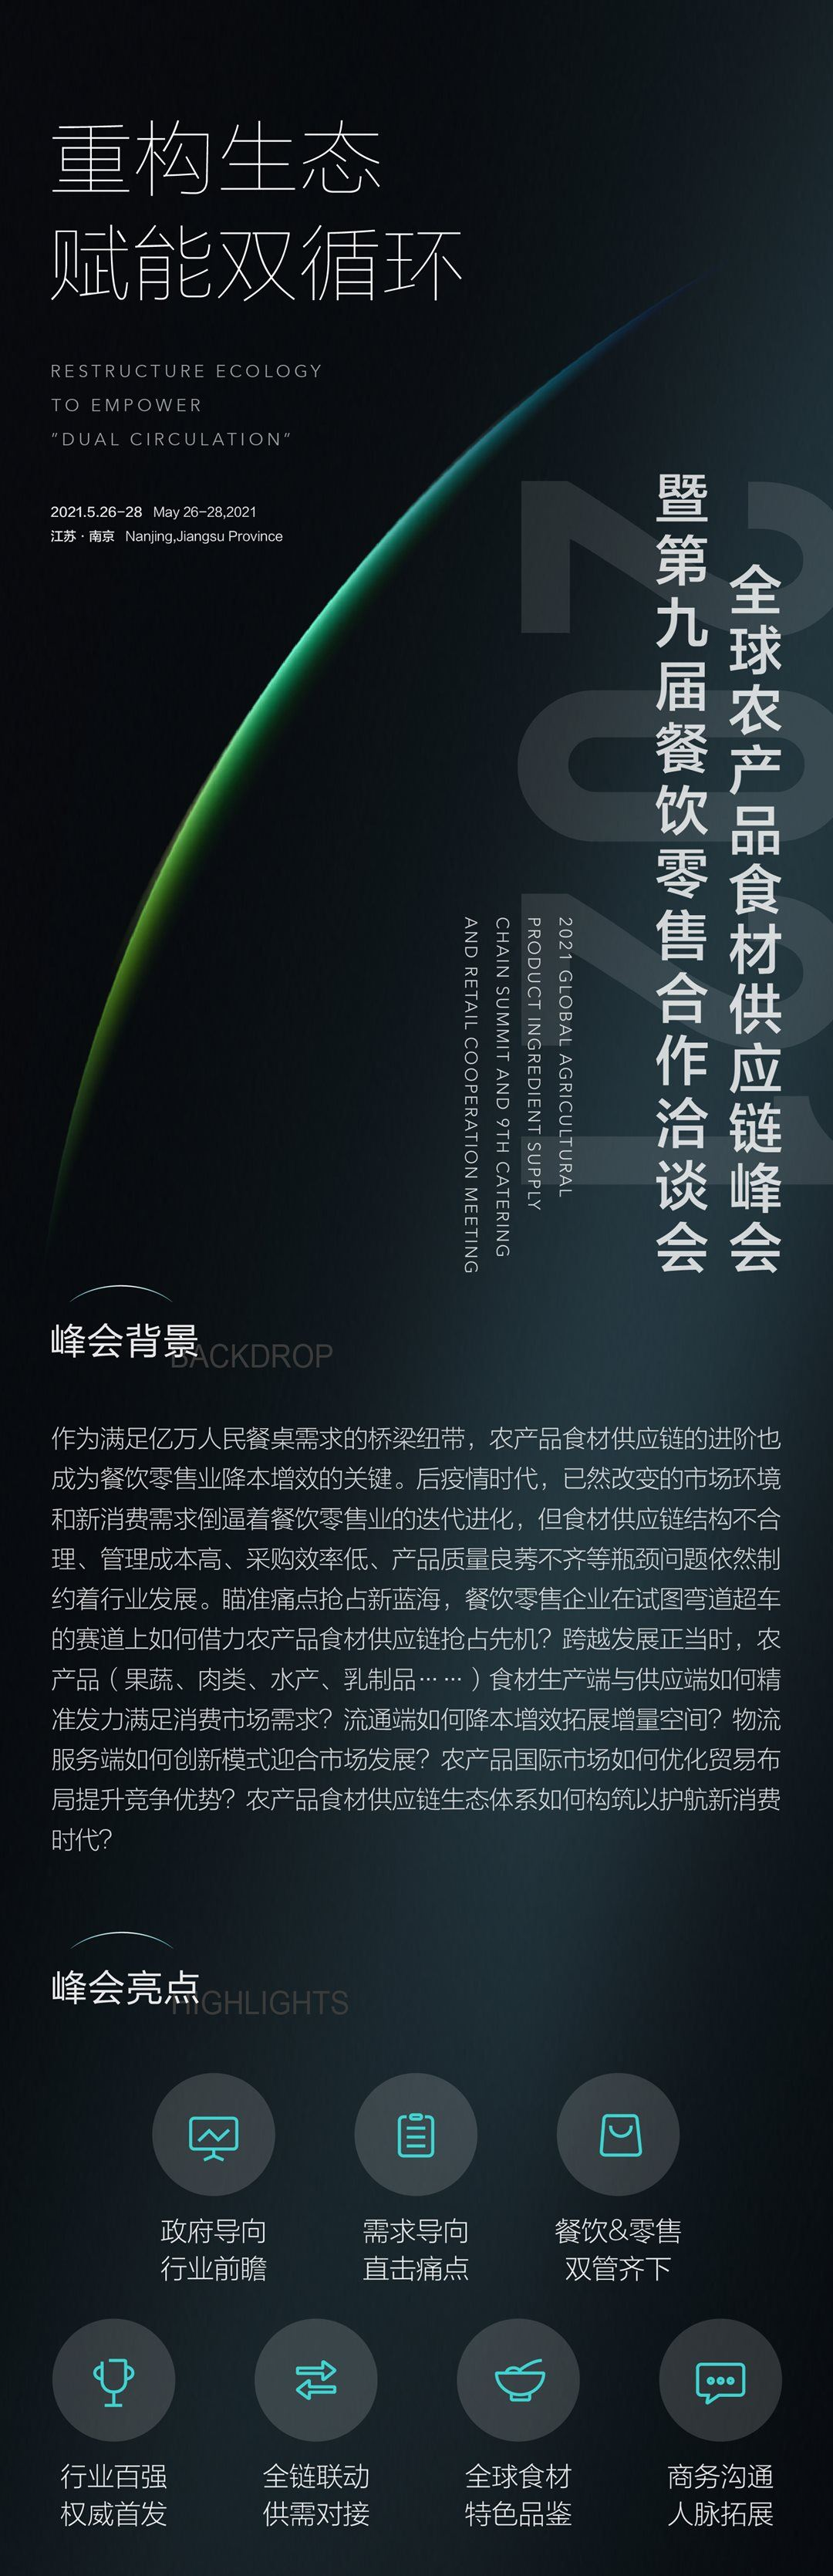 【20210511】议程长图_画板-1_01.png